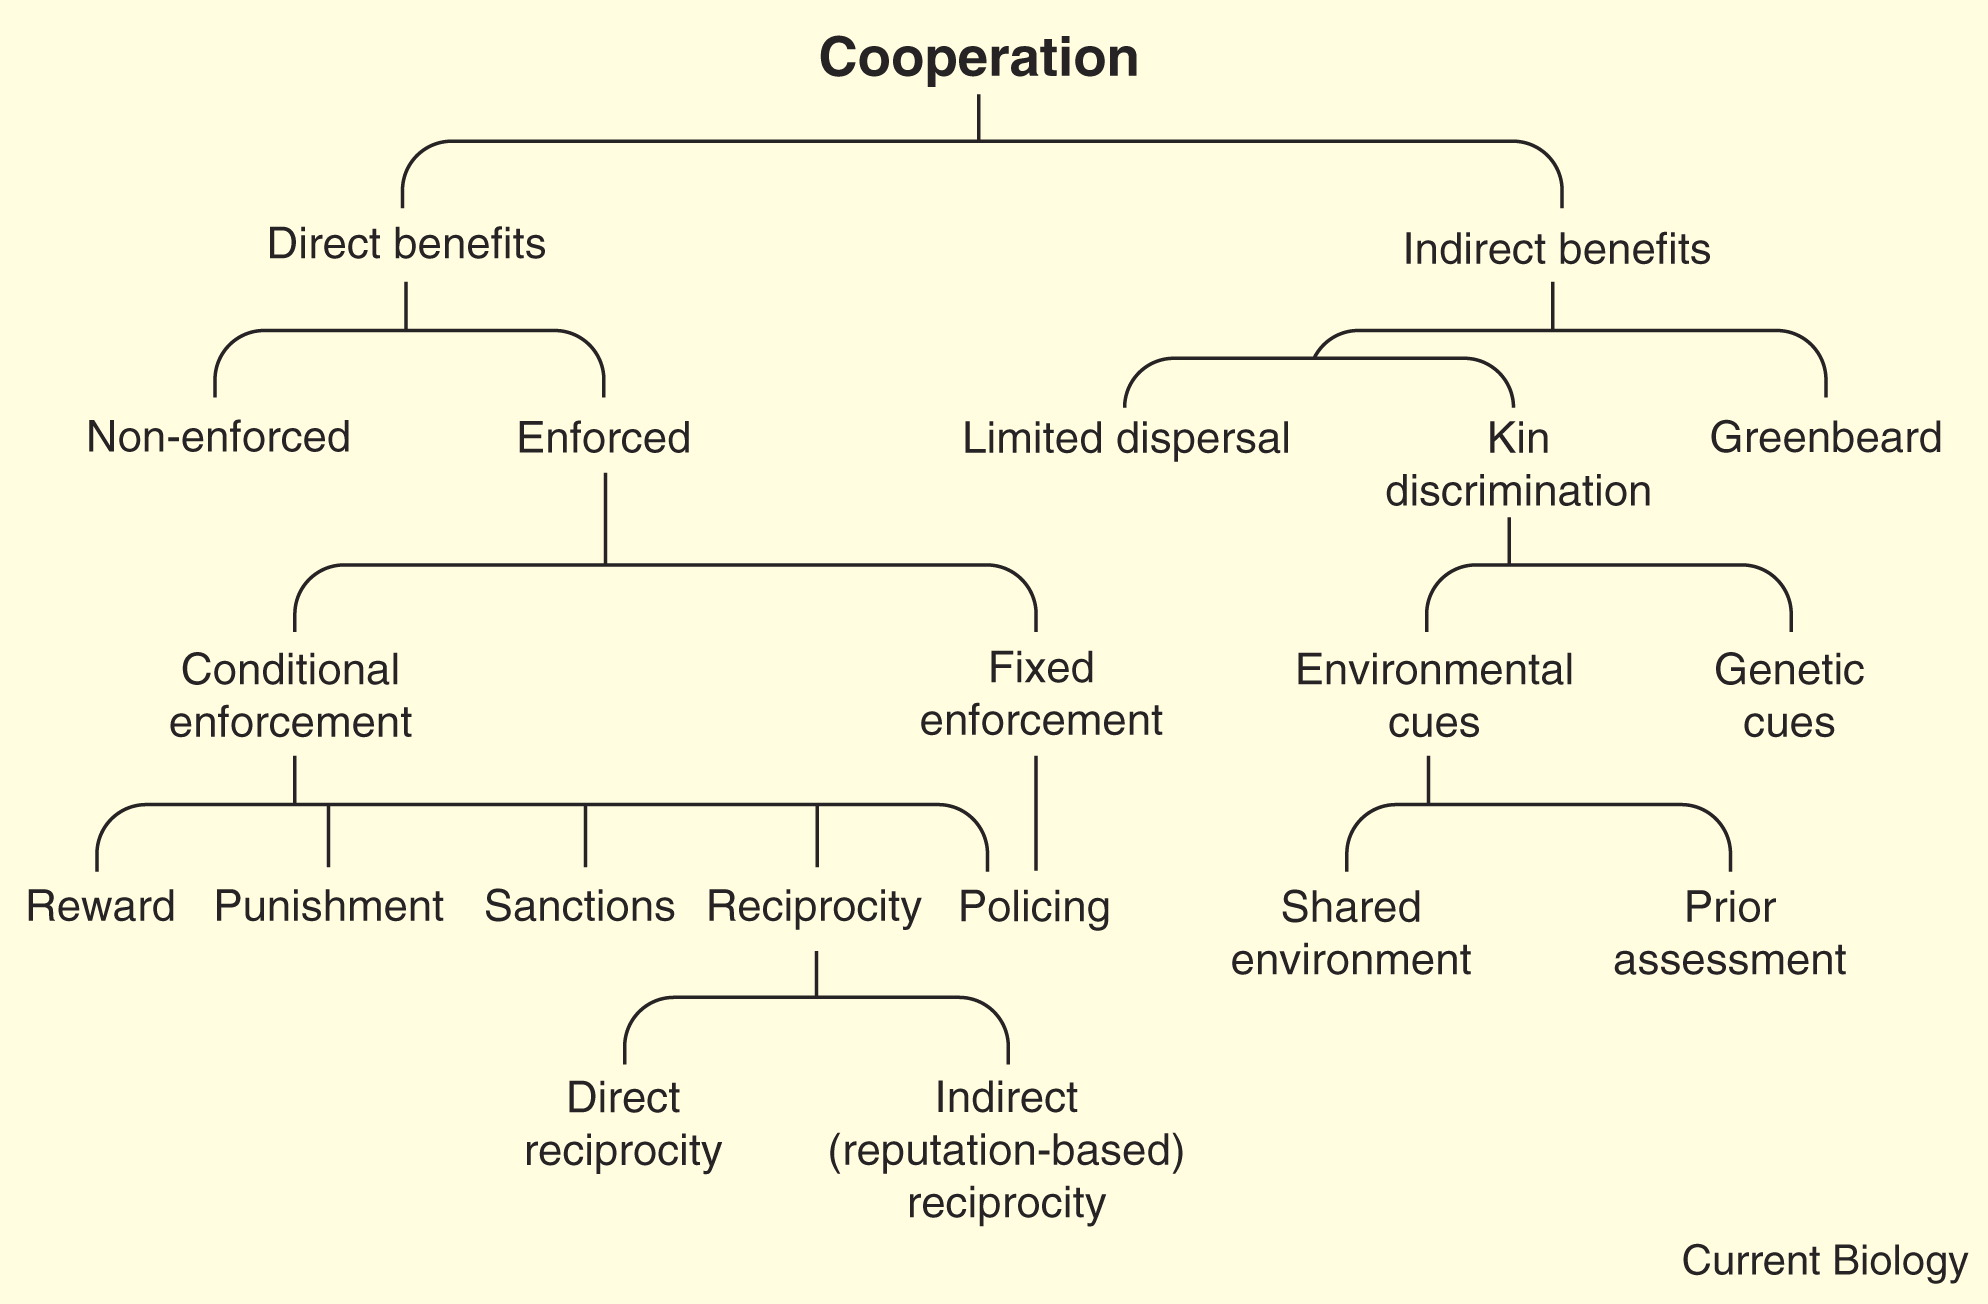 biological_cooperation_mechanisms